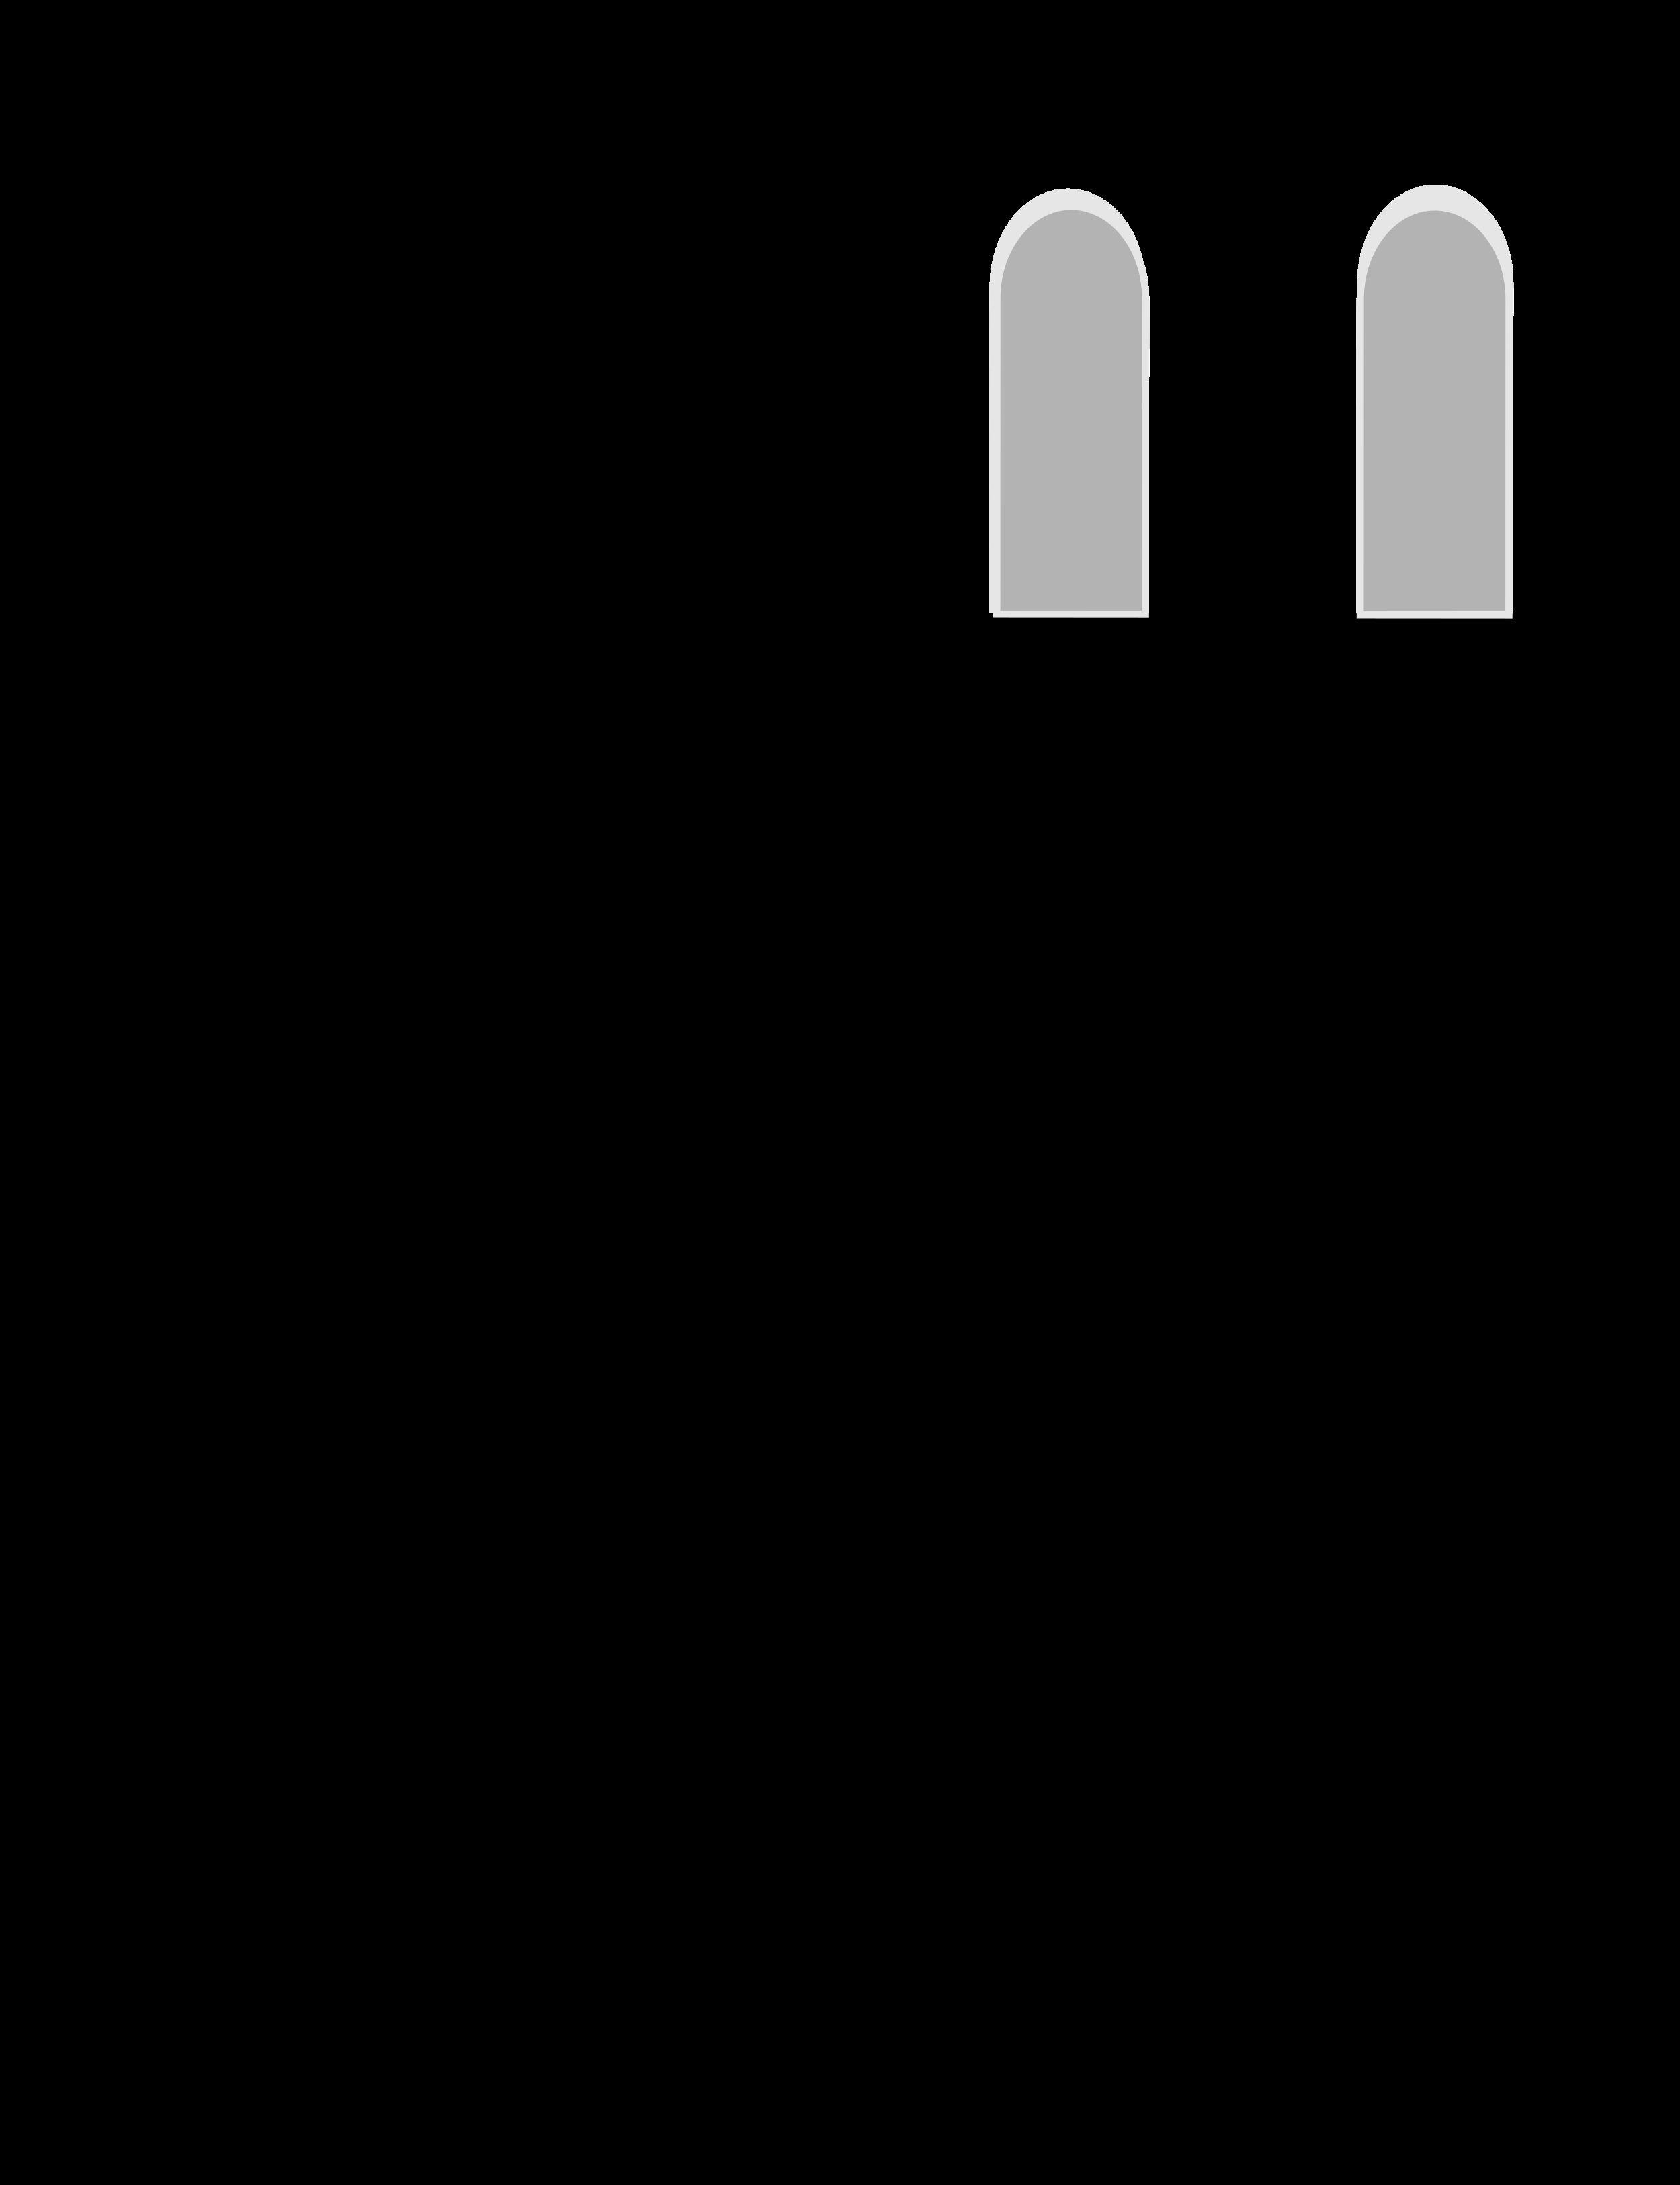 Plug Clipart Ideas Plugs Clip Art Power Plug